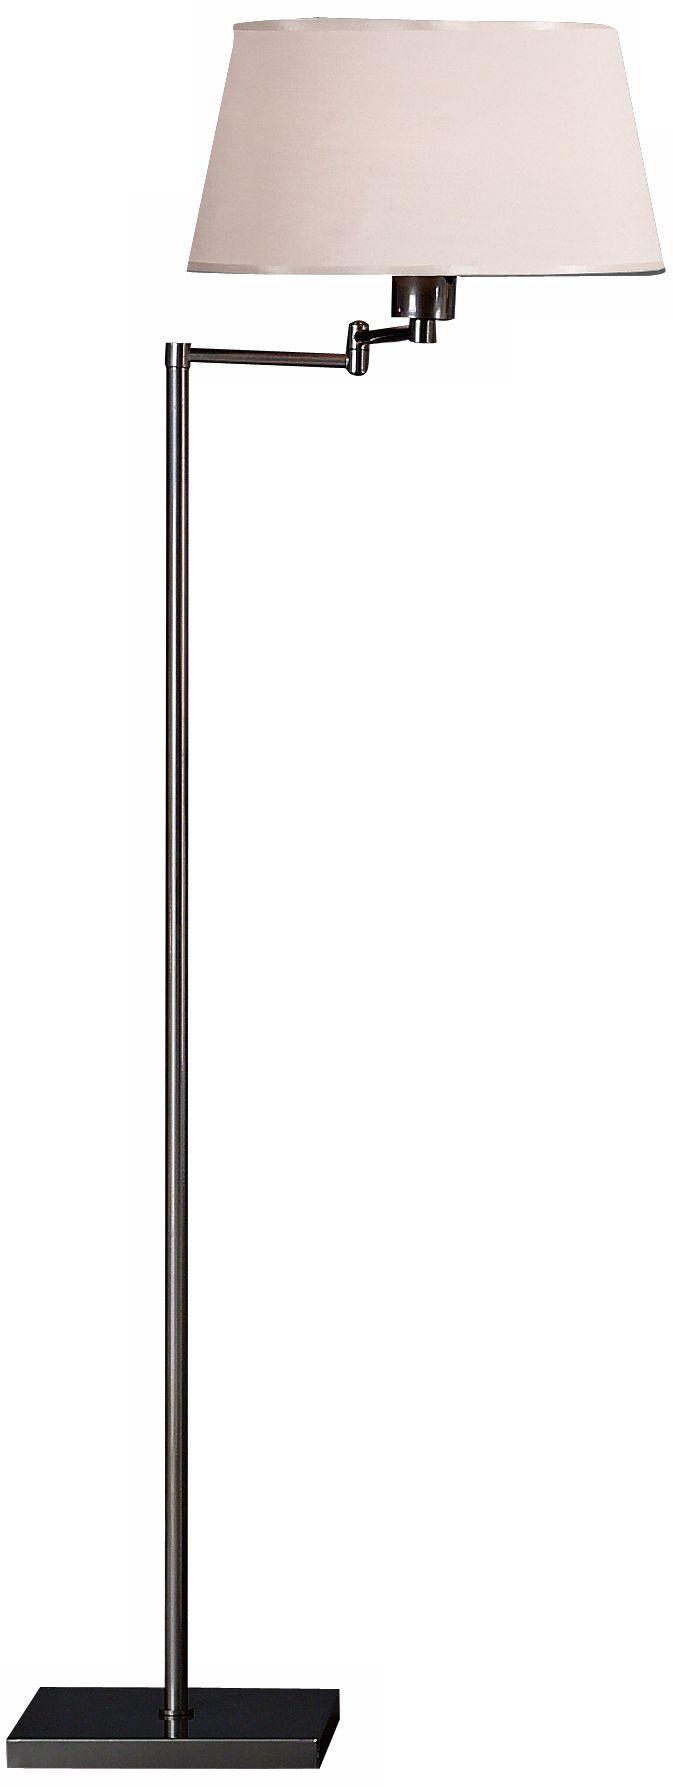 Robert Abbey Real Simple Gunmetal Swing Arm Floor Lamp   #J1694 | Lamps Plus